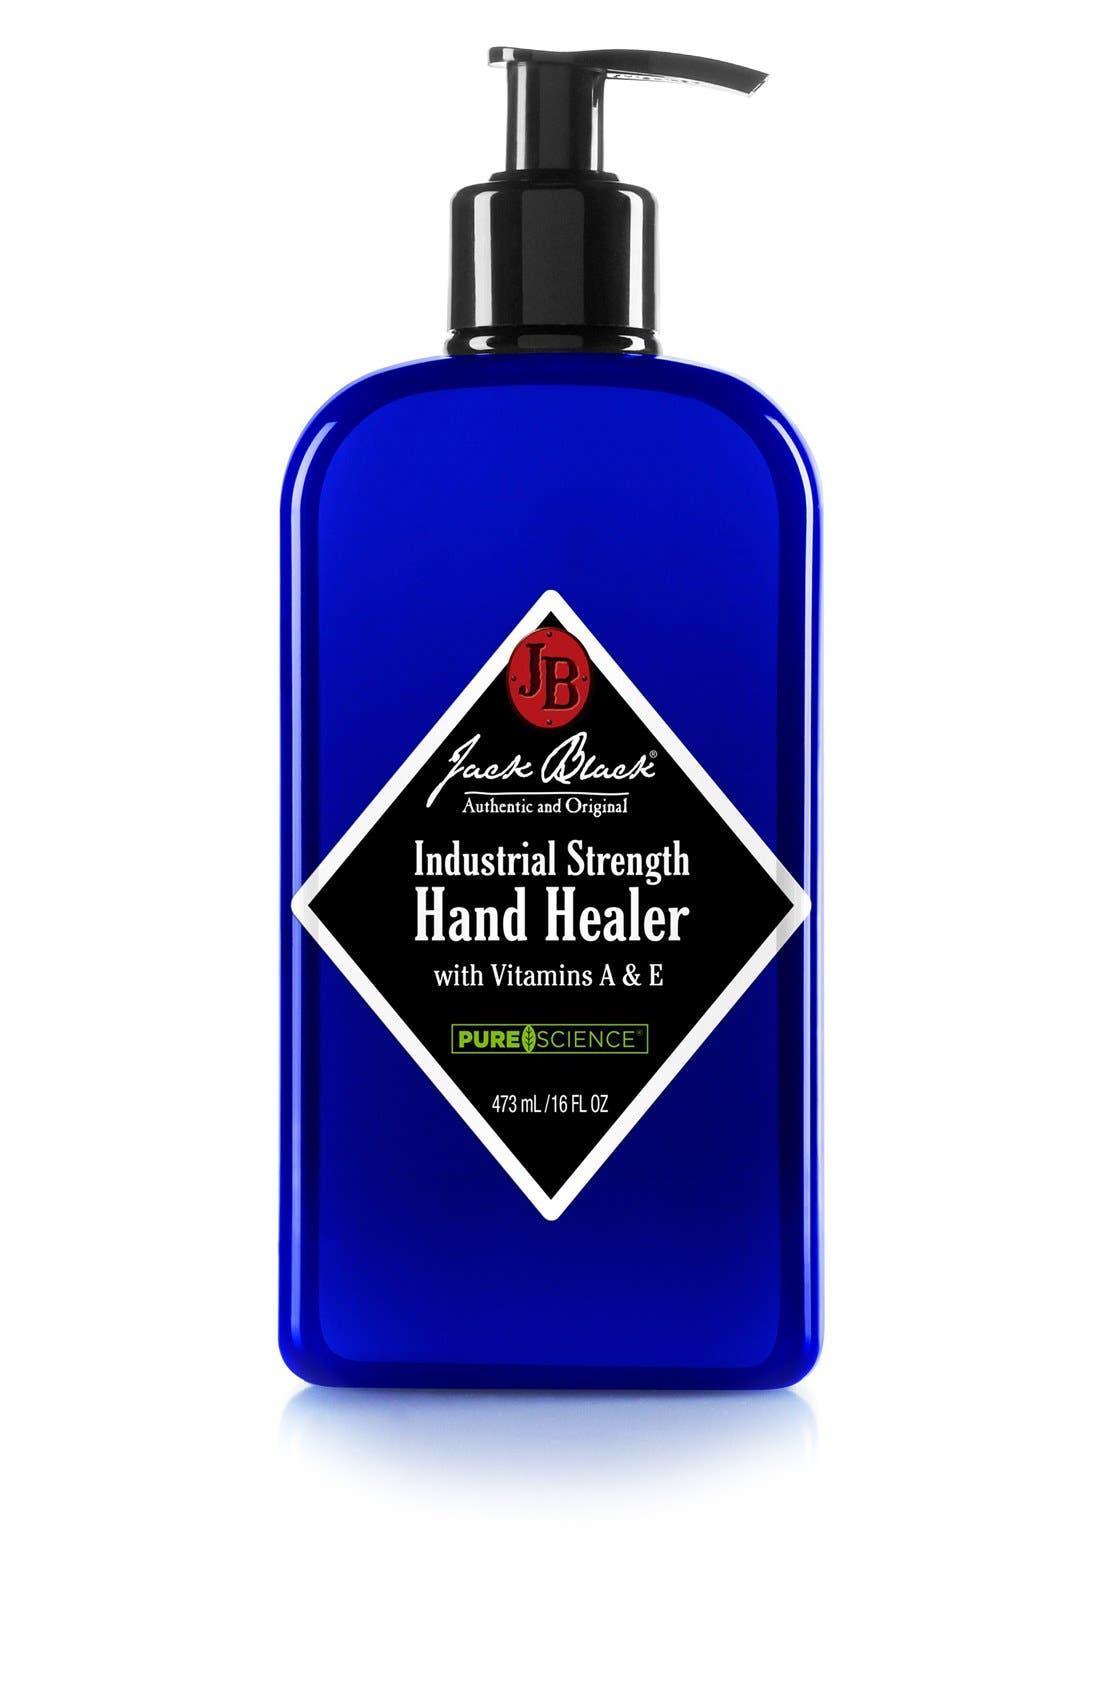 Jack Black Industrial Strength Hand Healer (Jumbo Size)